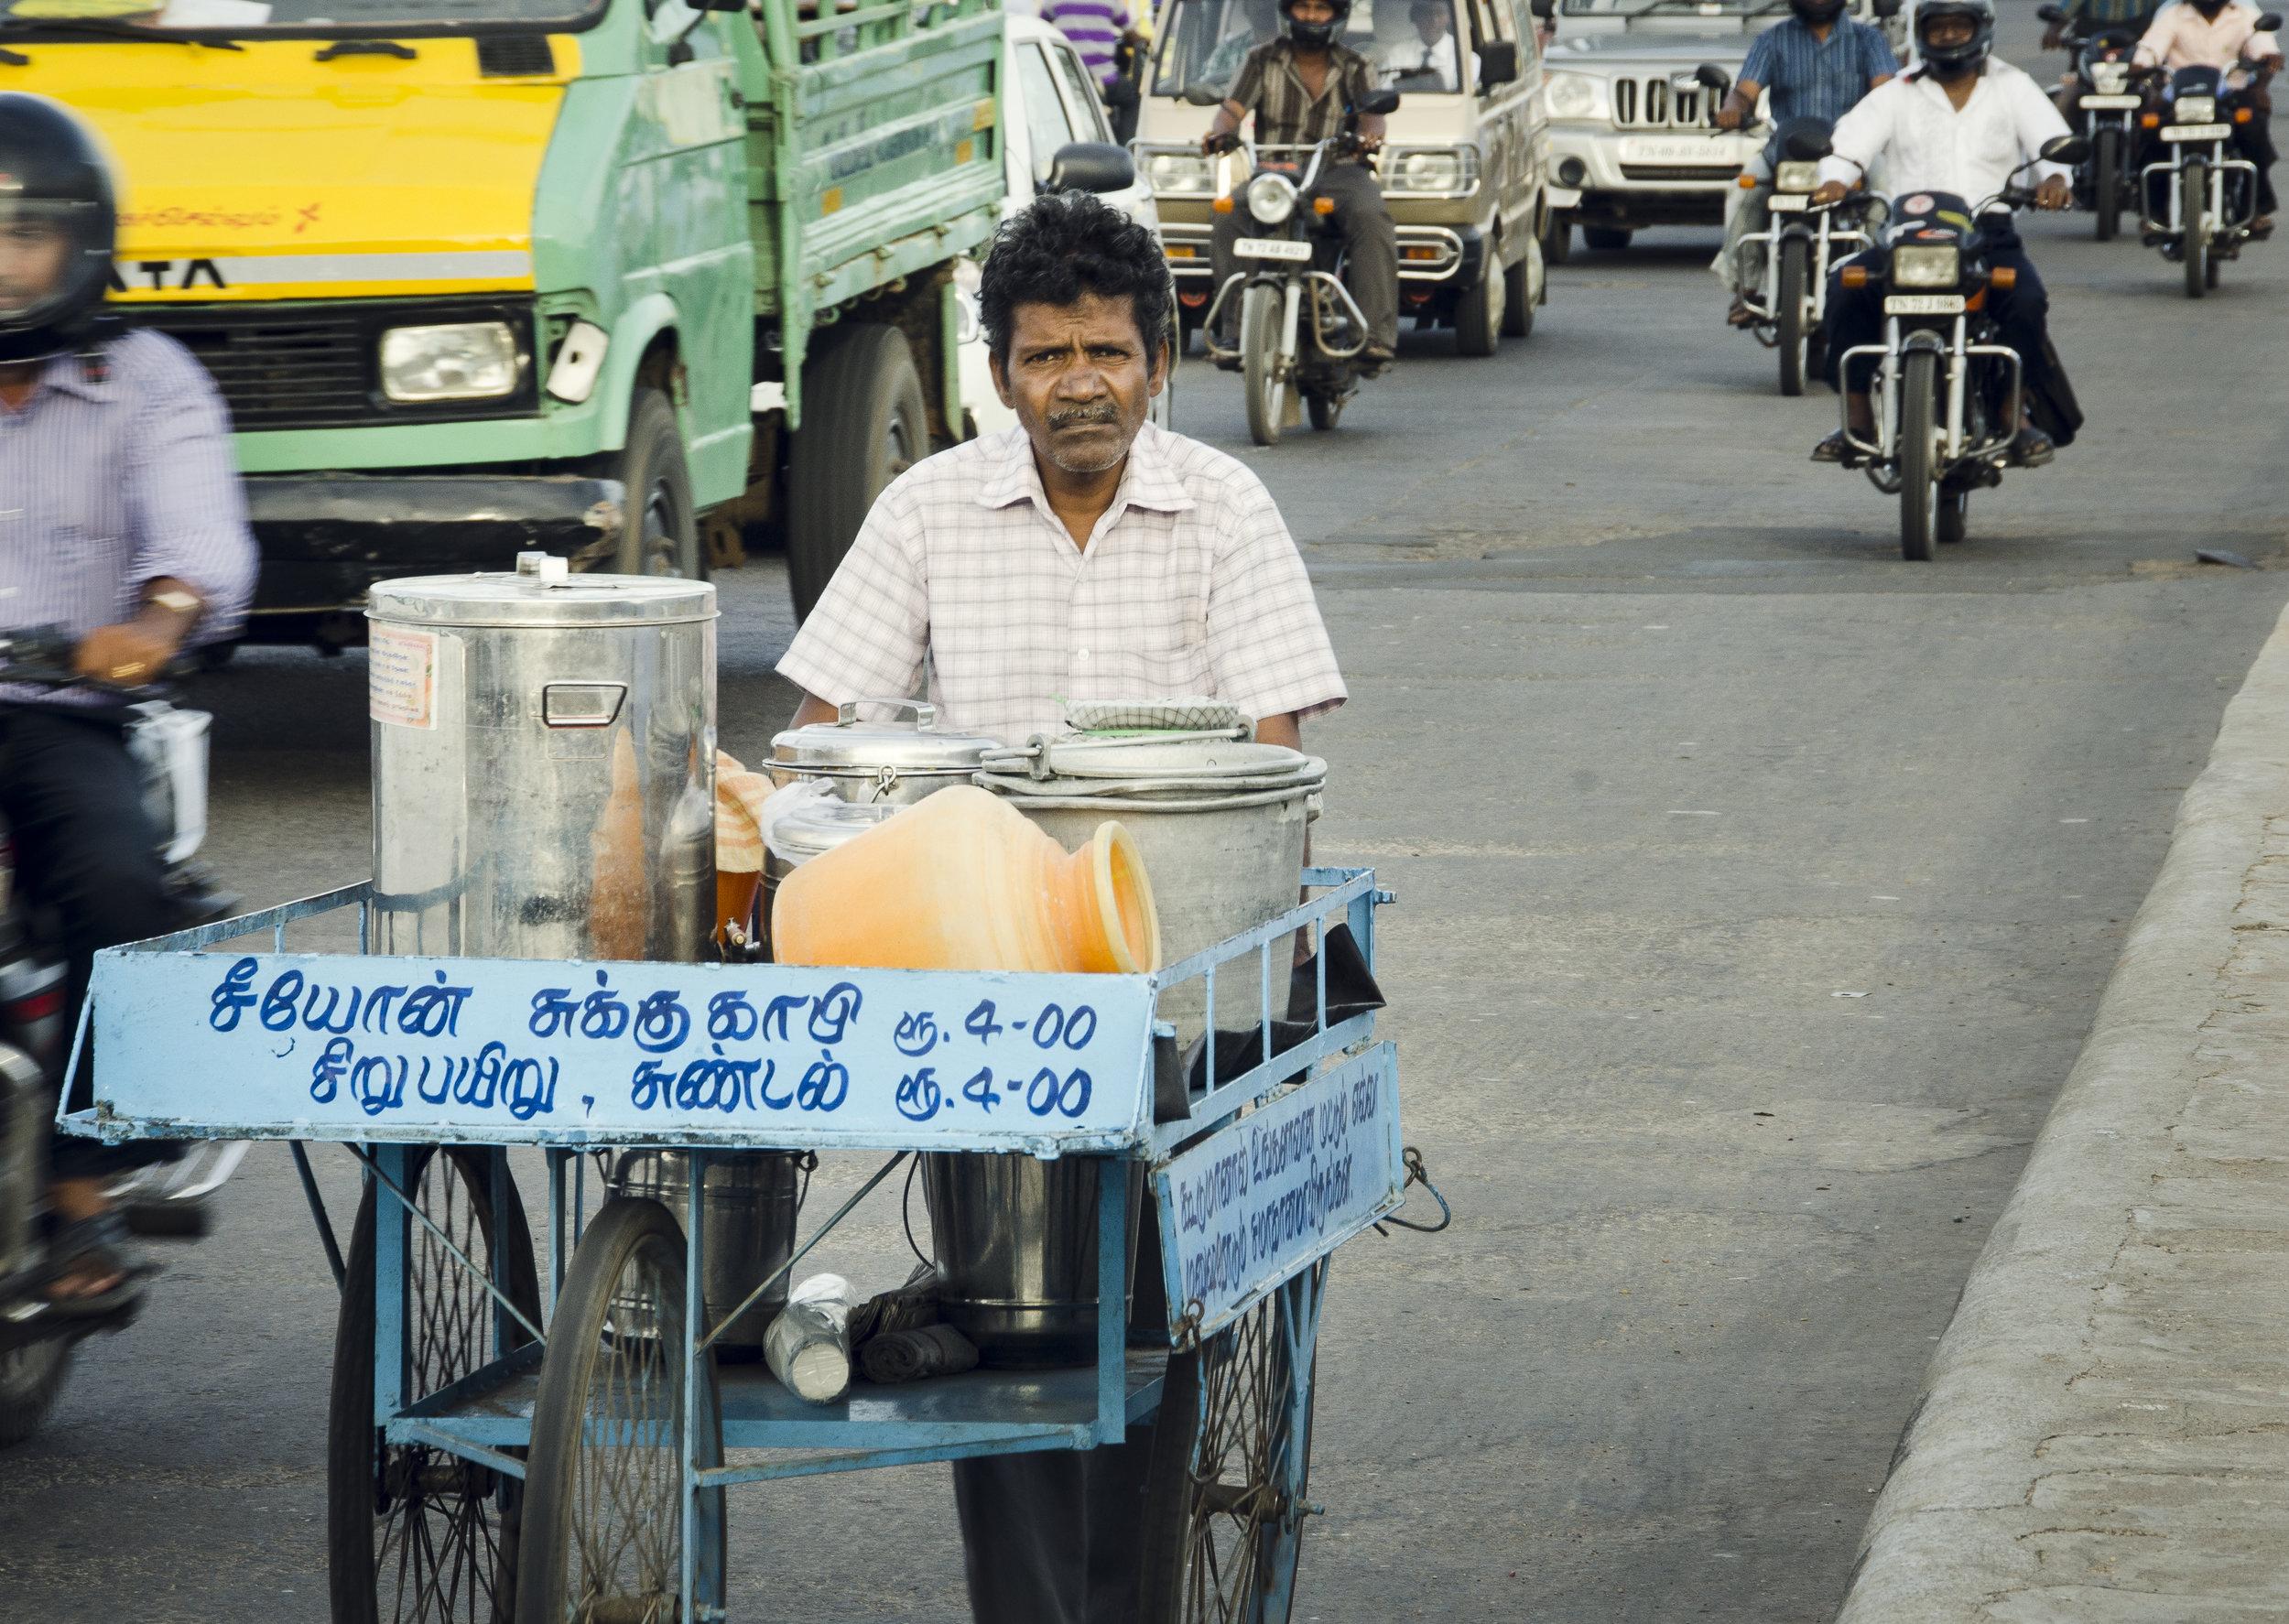 India-522.jpg